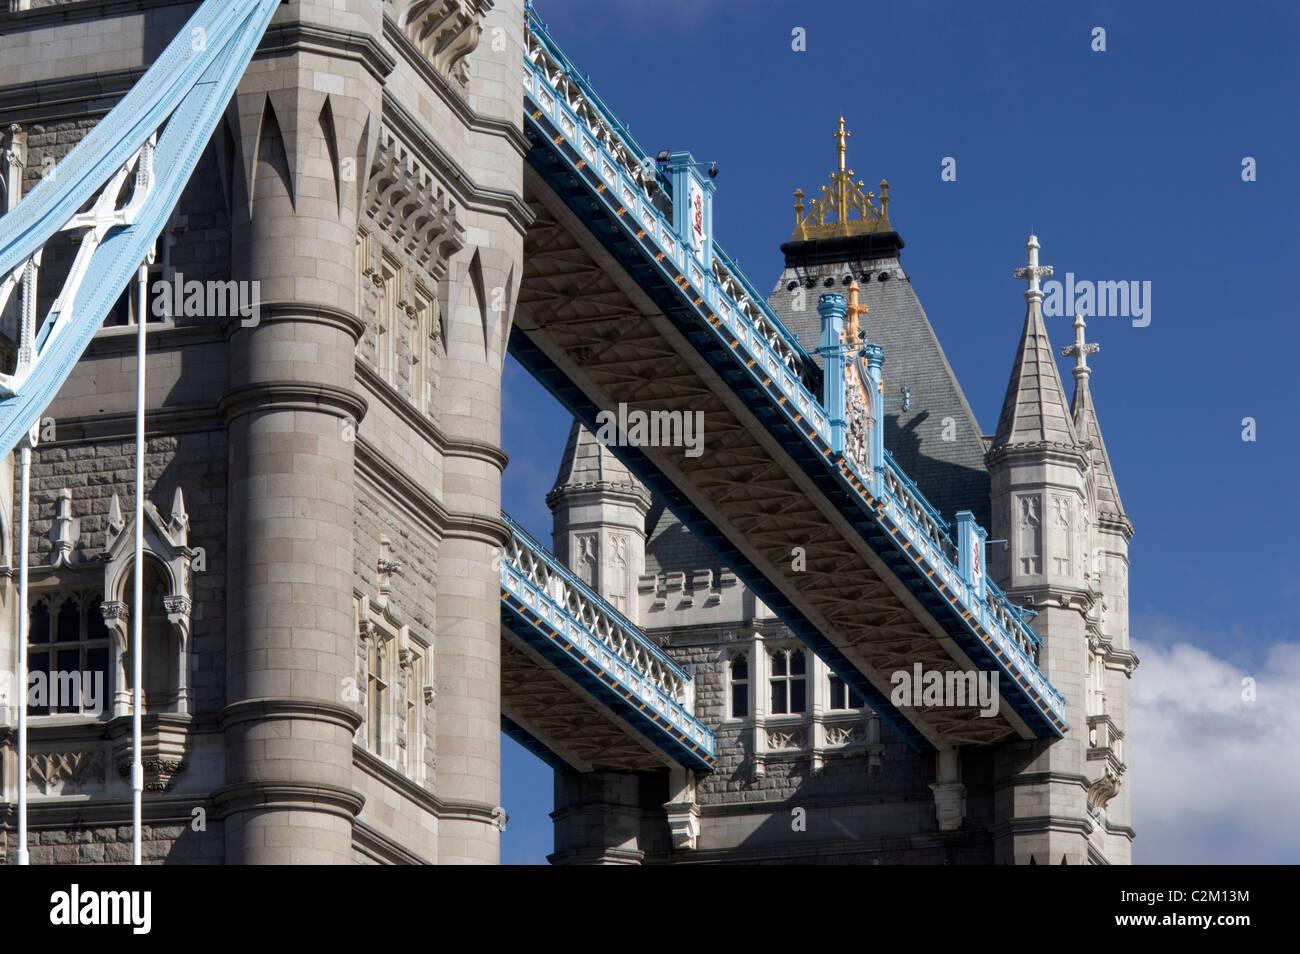 Tower Bridge, London, 1886 - 1894. Detail of high-level walkways. - Stock Image